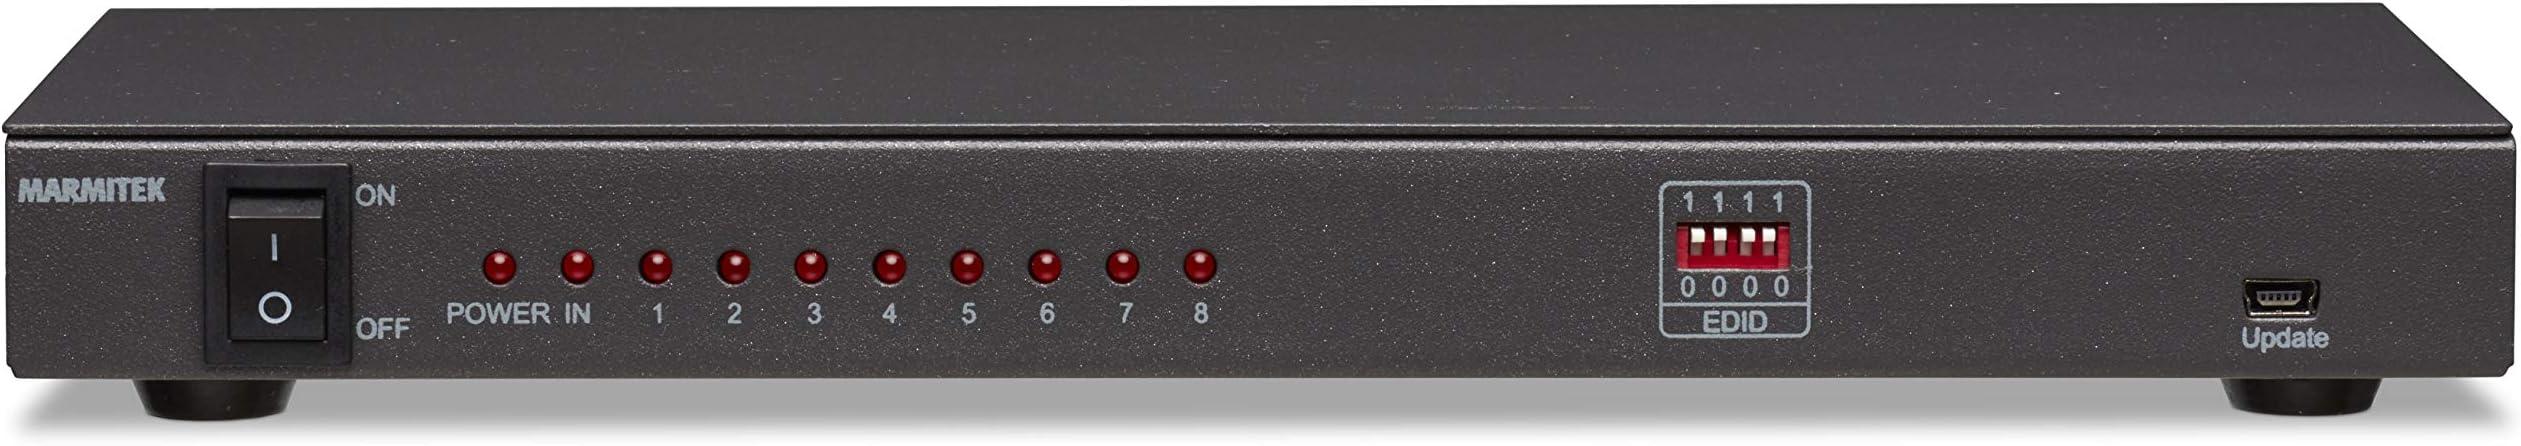 Split 418 UHD - Splitter HDMI | 1 Entrada/8 Salidas | 3D | UHD |: Amazon.es: Electrónica